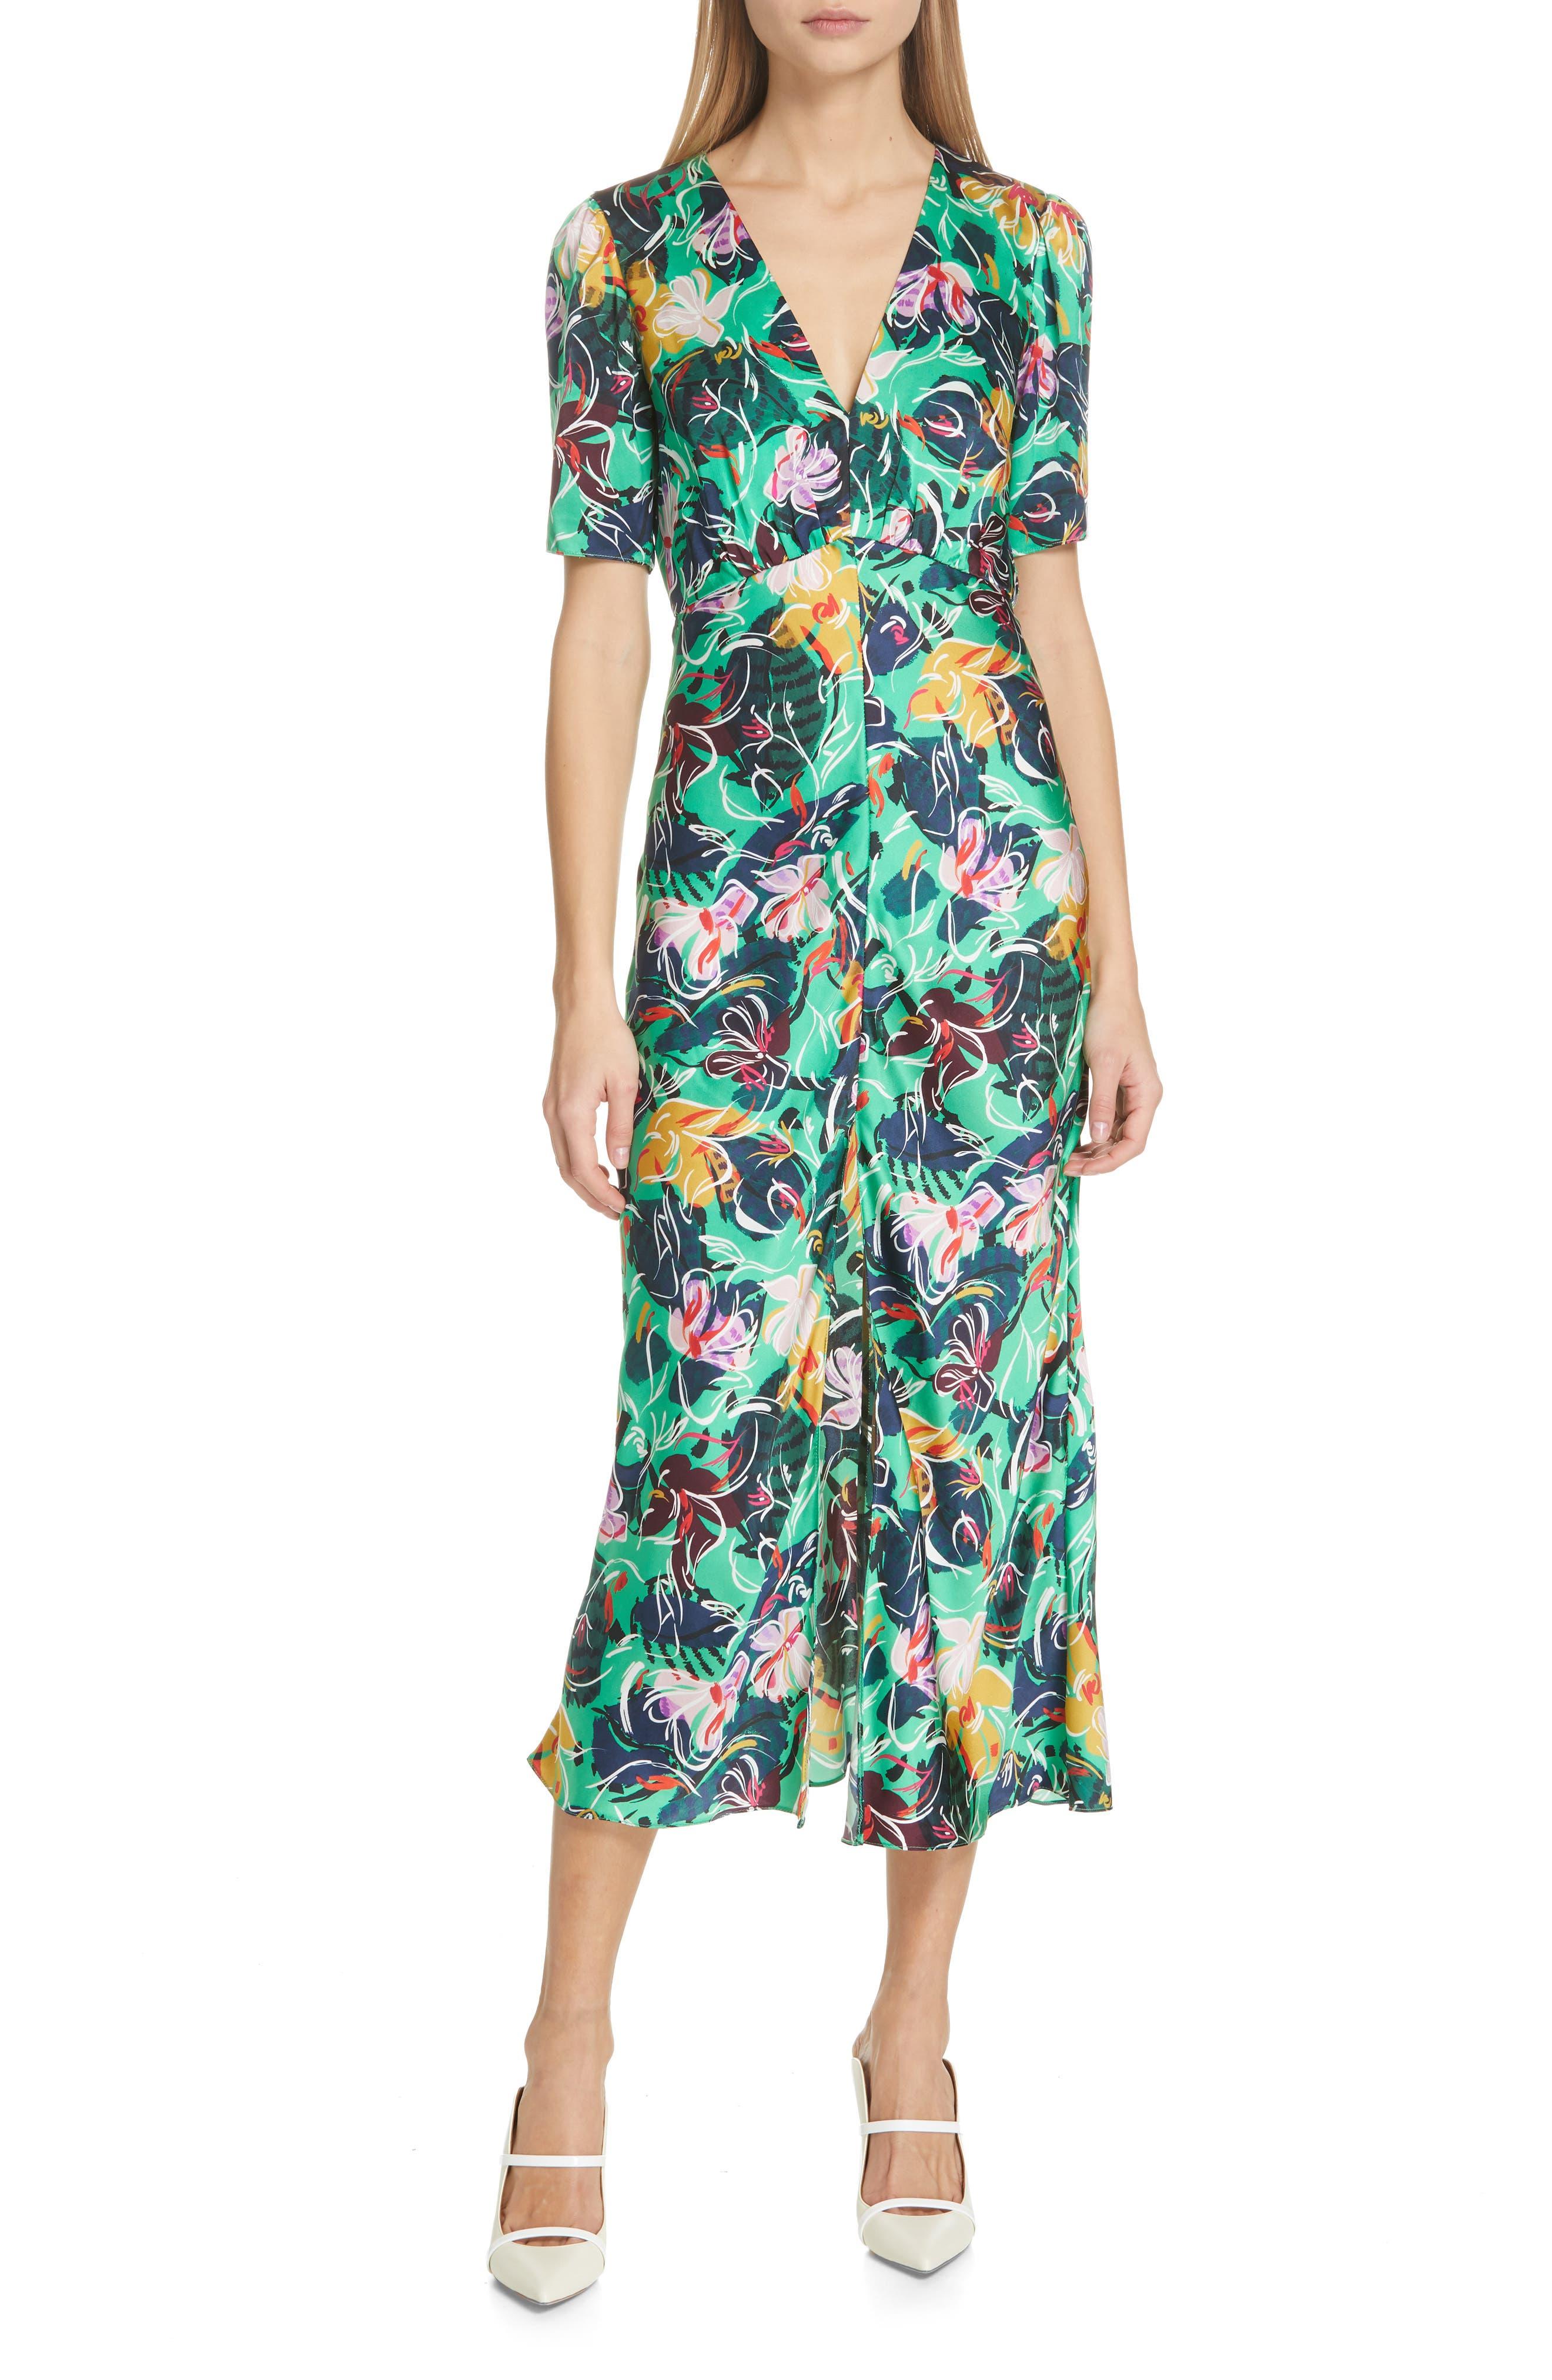 SALONI Eden Floral Print Silk Midi Dress, Main, color, EMERALD KINGCUP